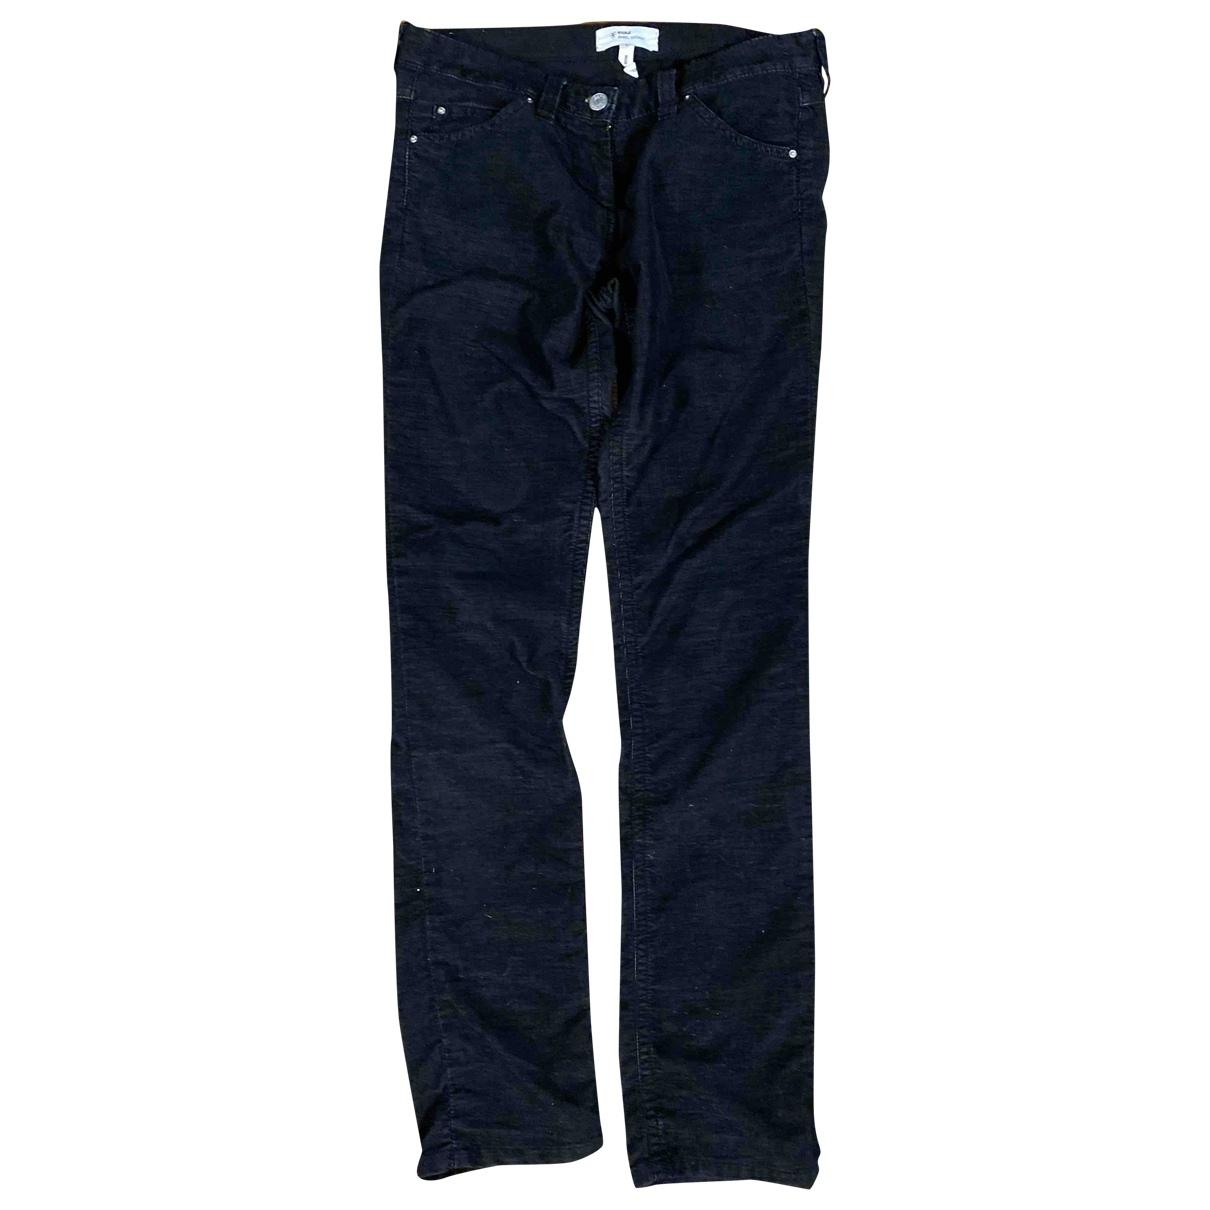 Isabel Marant Etoile \N Navy Cotton Trousers for Women XS International